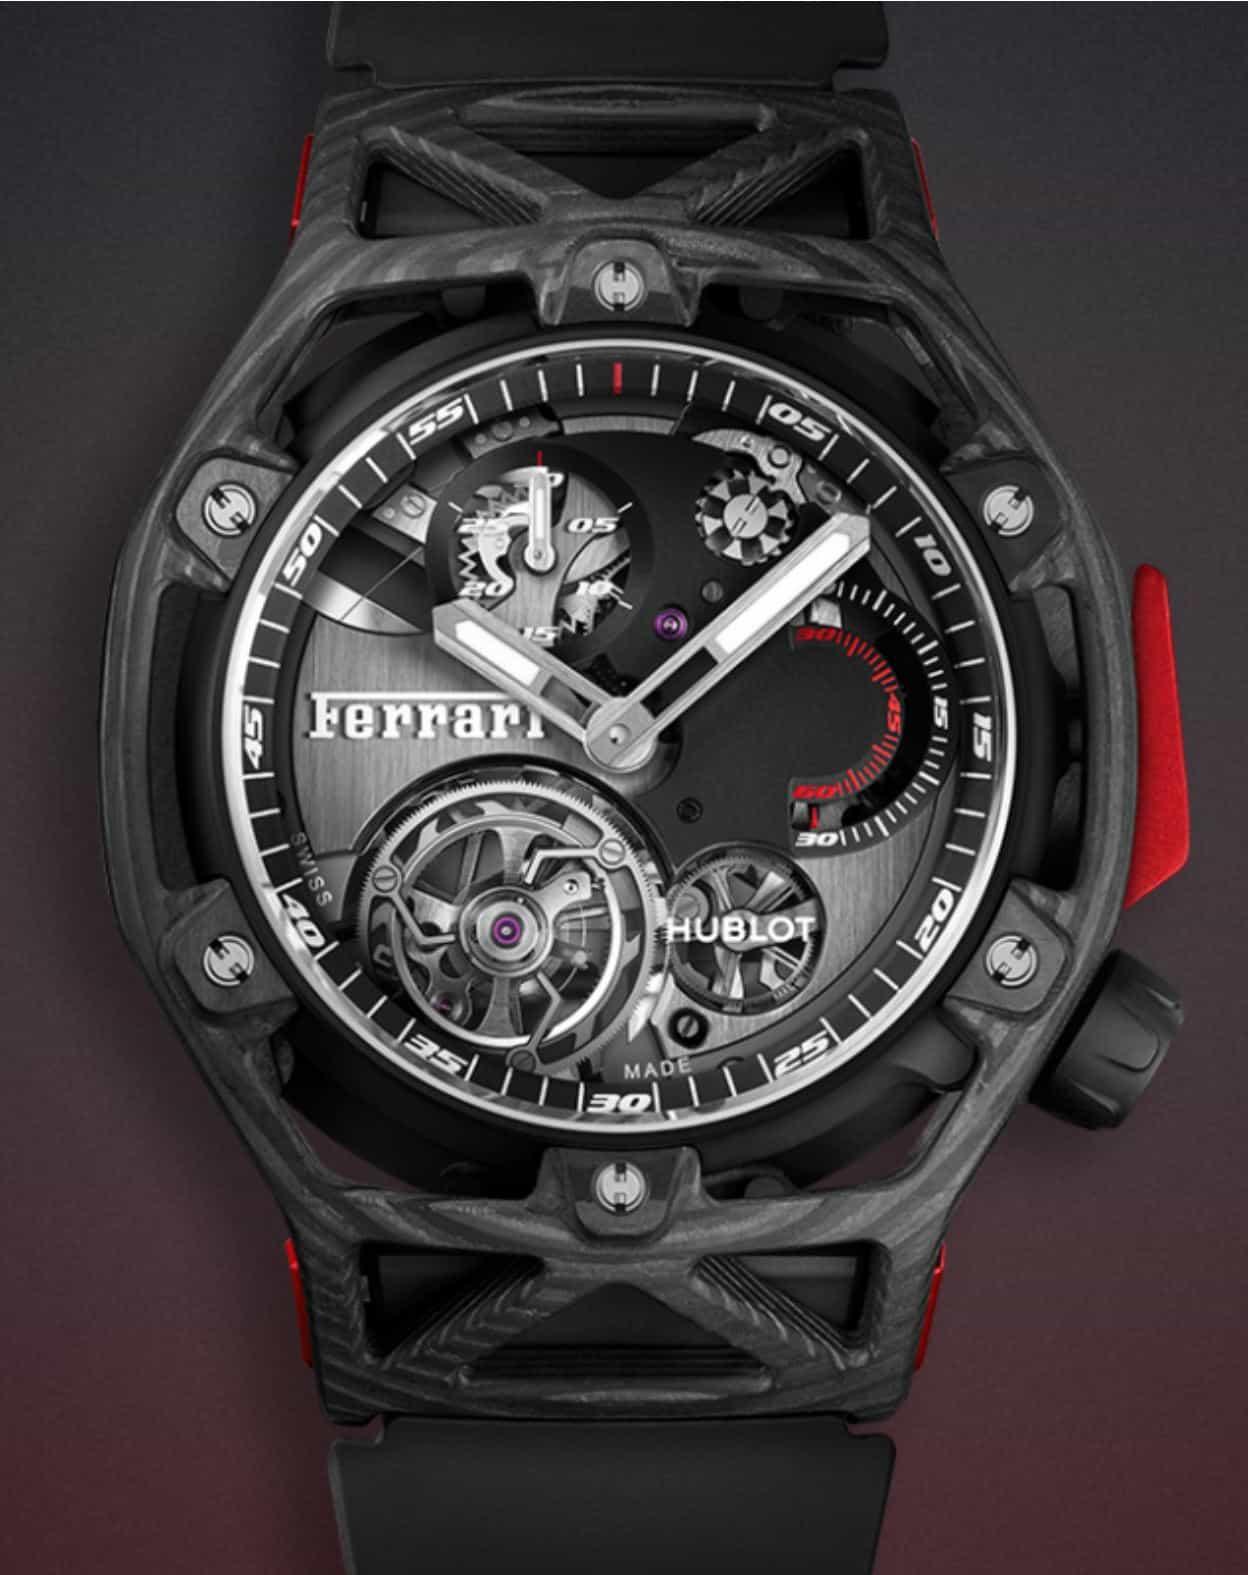 Hublot Techframe Ferrari 70 years Tourbillon Chronograph Limited 70 Ex